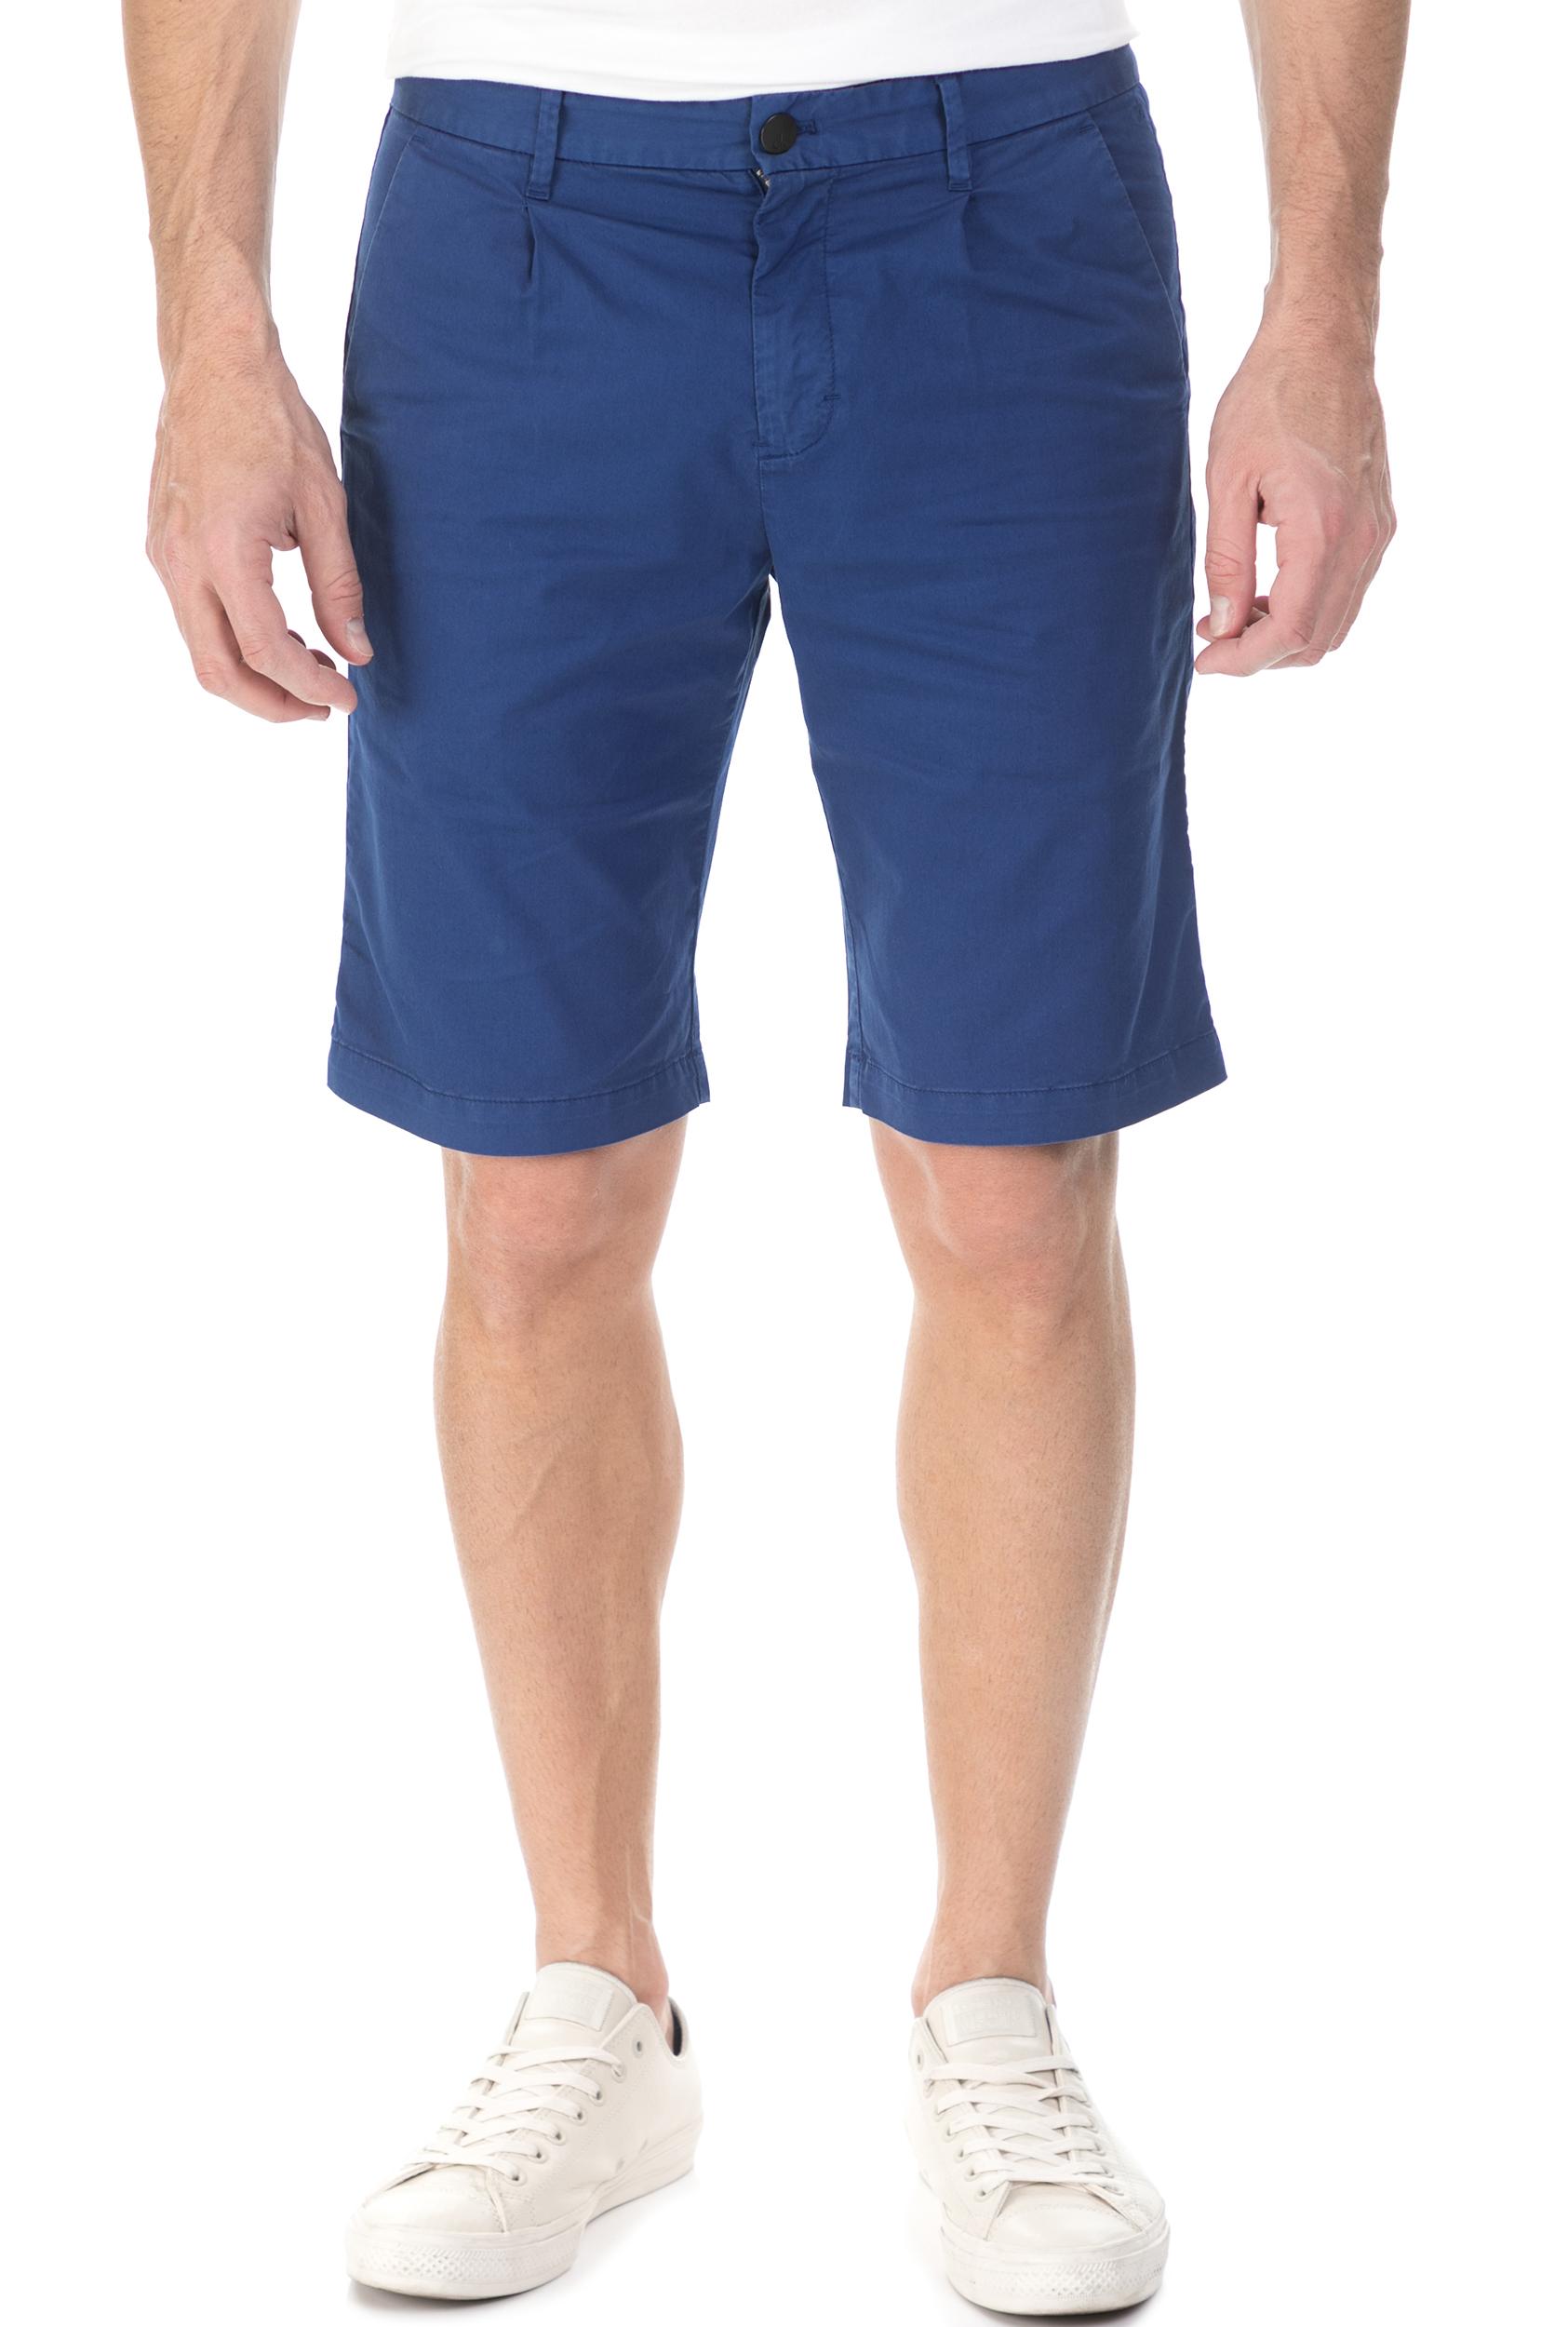 CALVIN KLEIN JEANS - Ανδρικη βερμούδα chino Calvin Klein Jeans HAYDEN PLEAT μπλε ανδρικά ρούχα σορτς βερμούδες casual jean